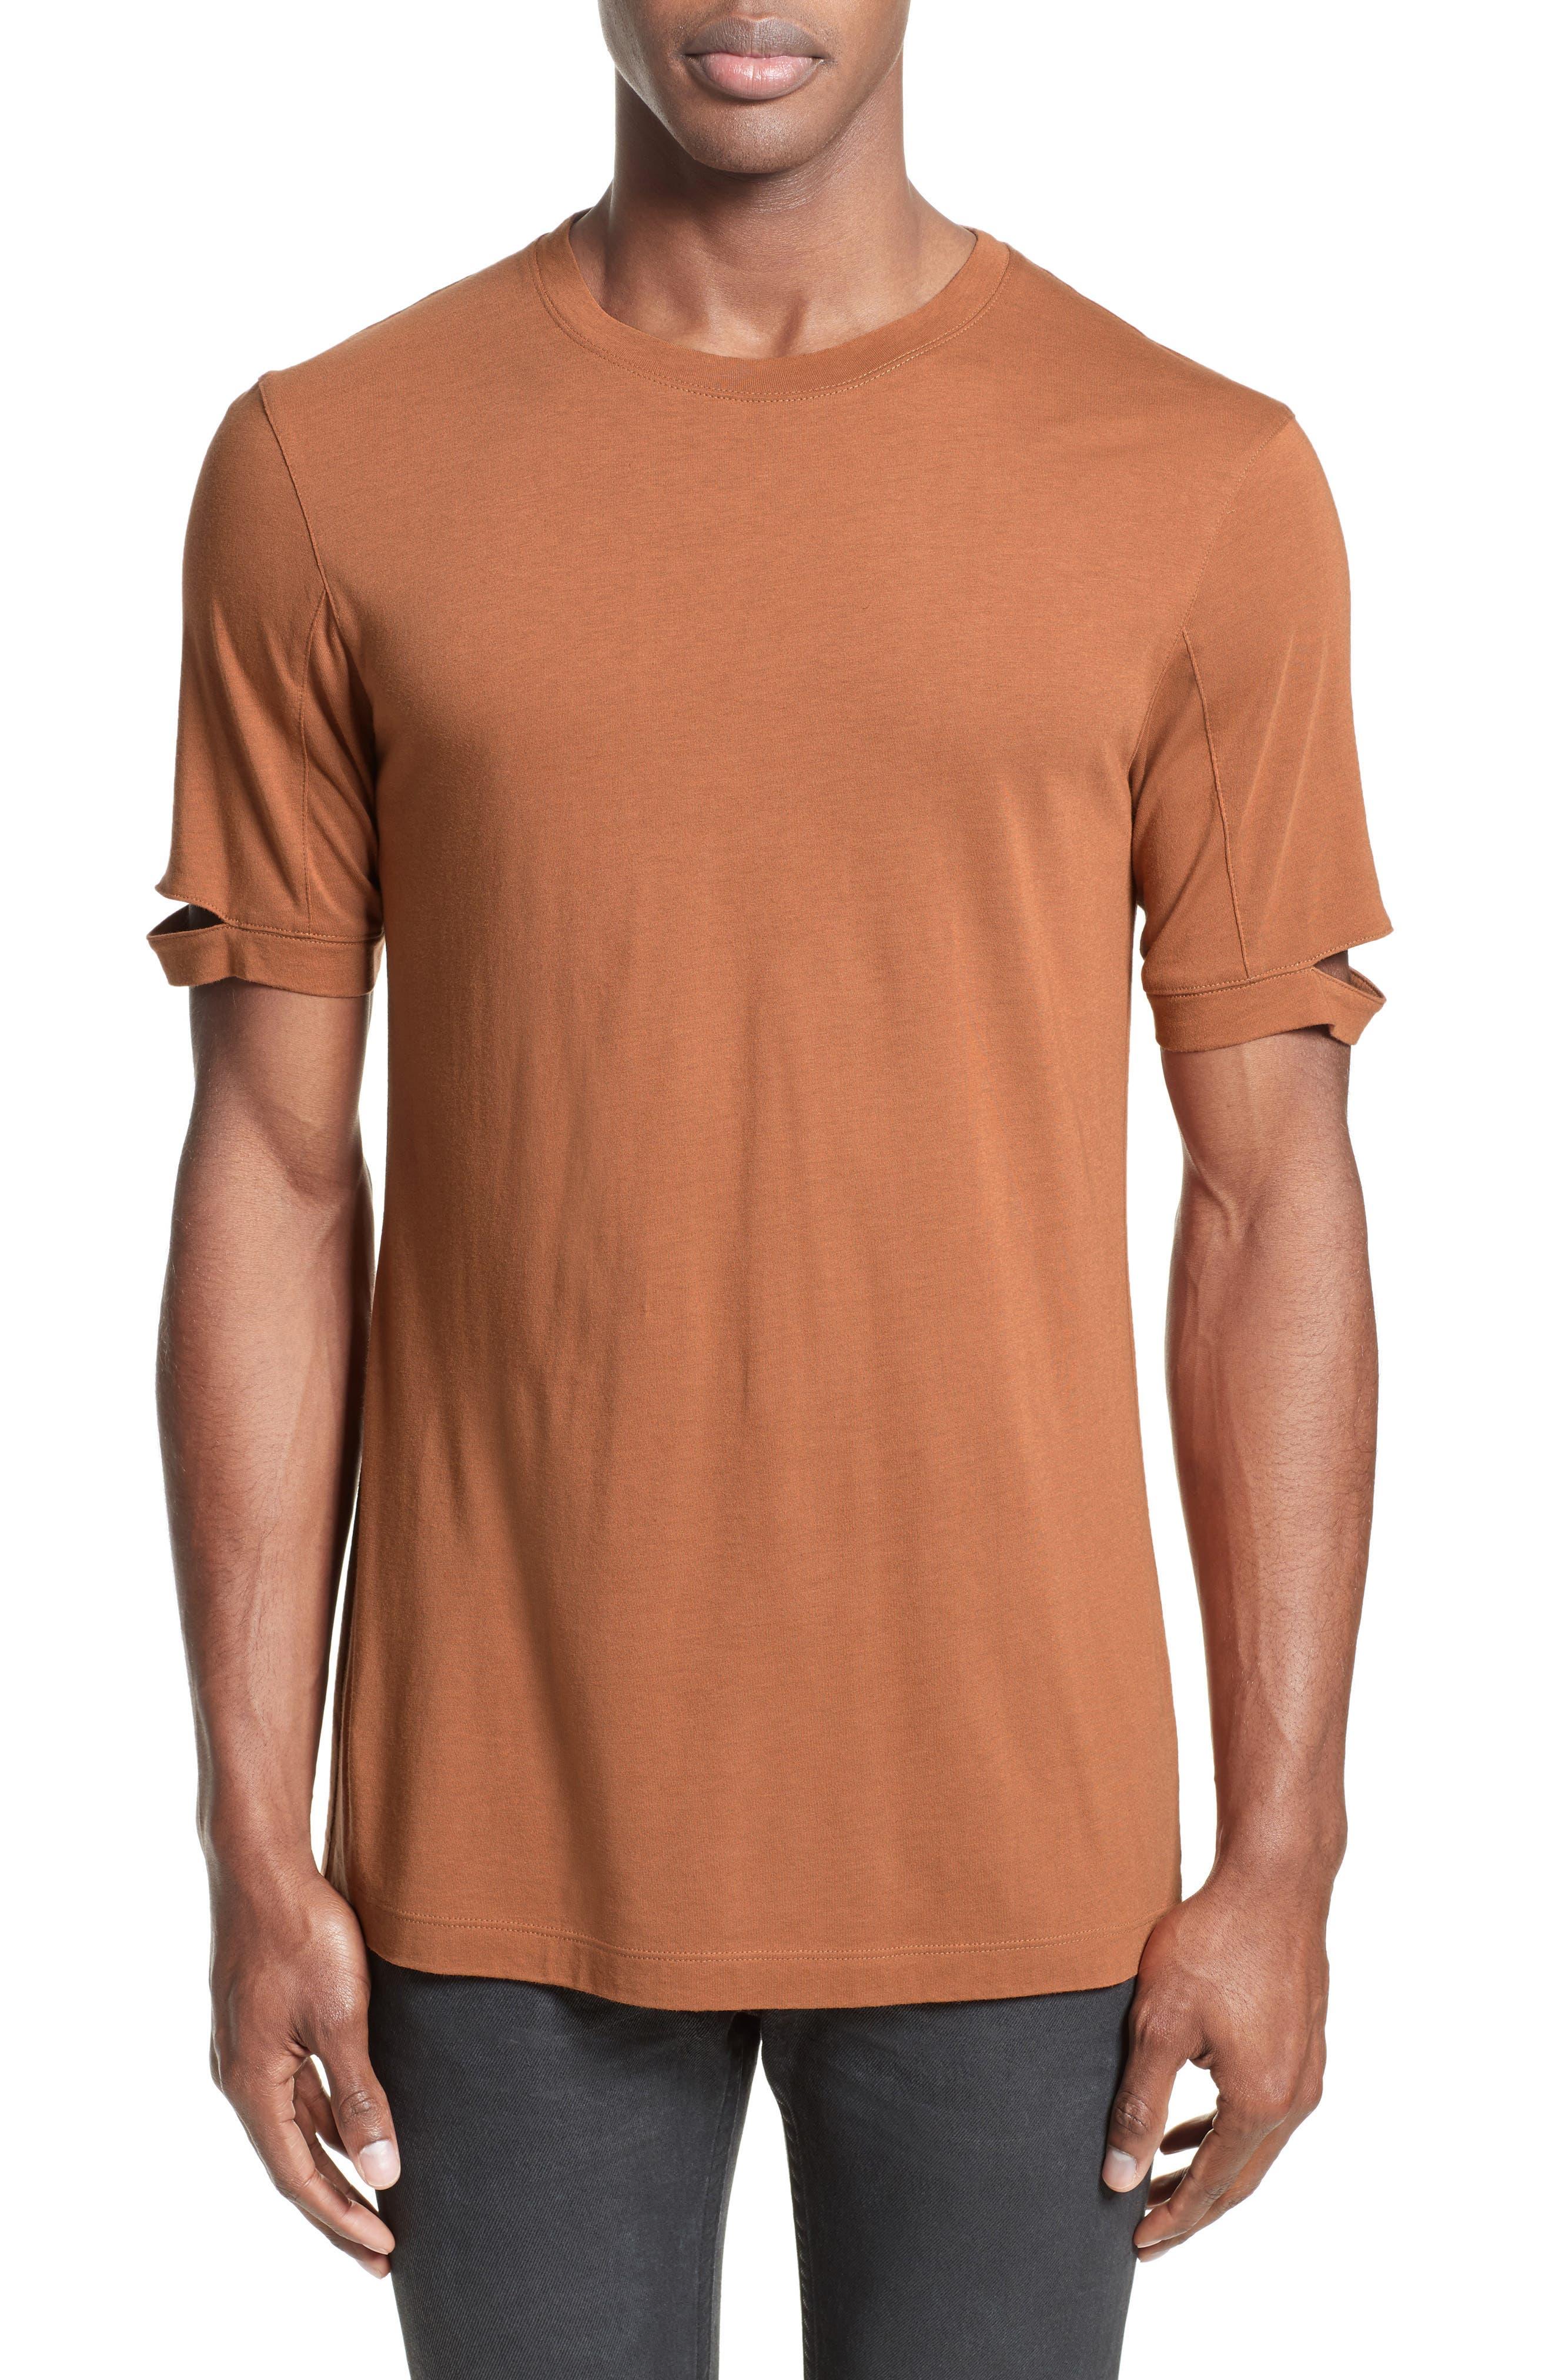 Main Image - Helmut Lang Sliced Sleeve T-Shirt